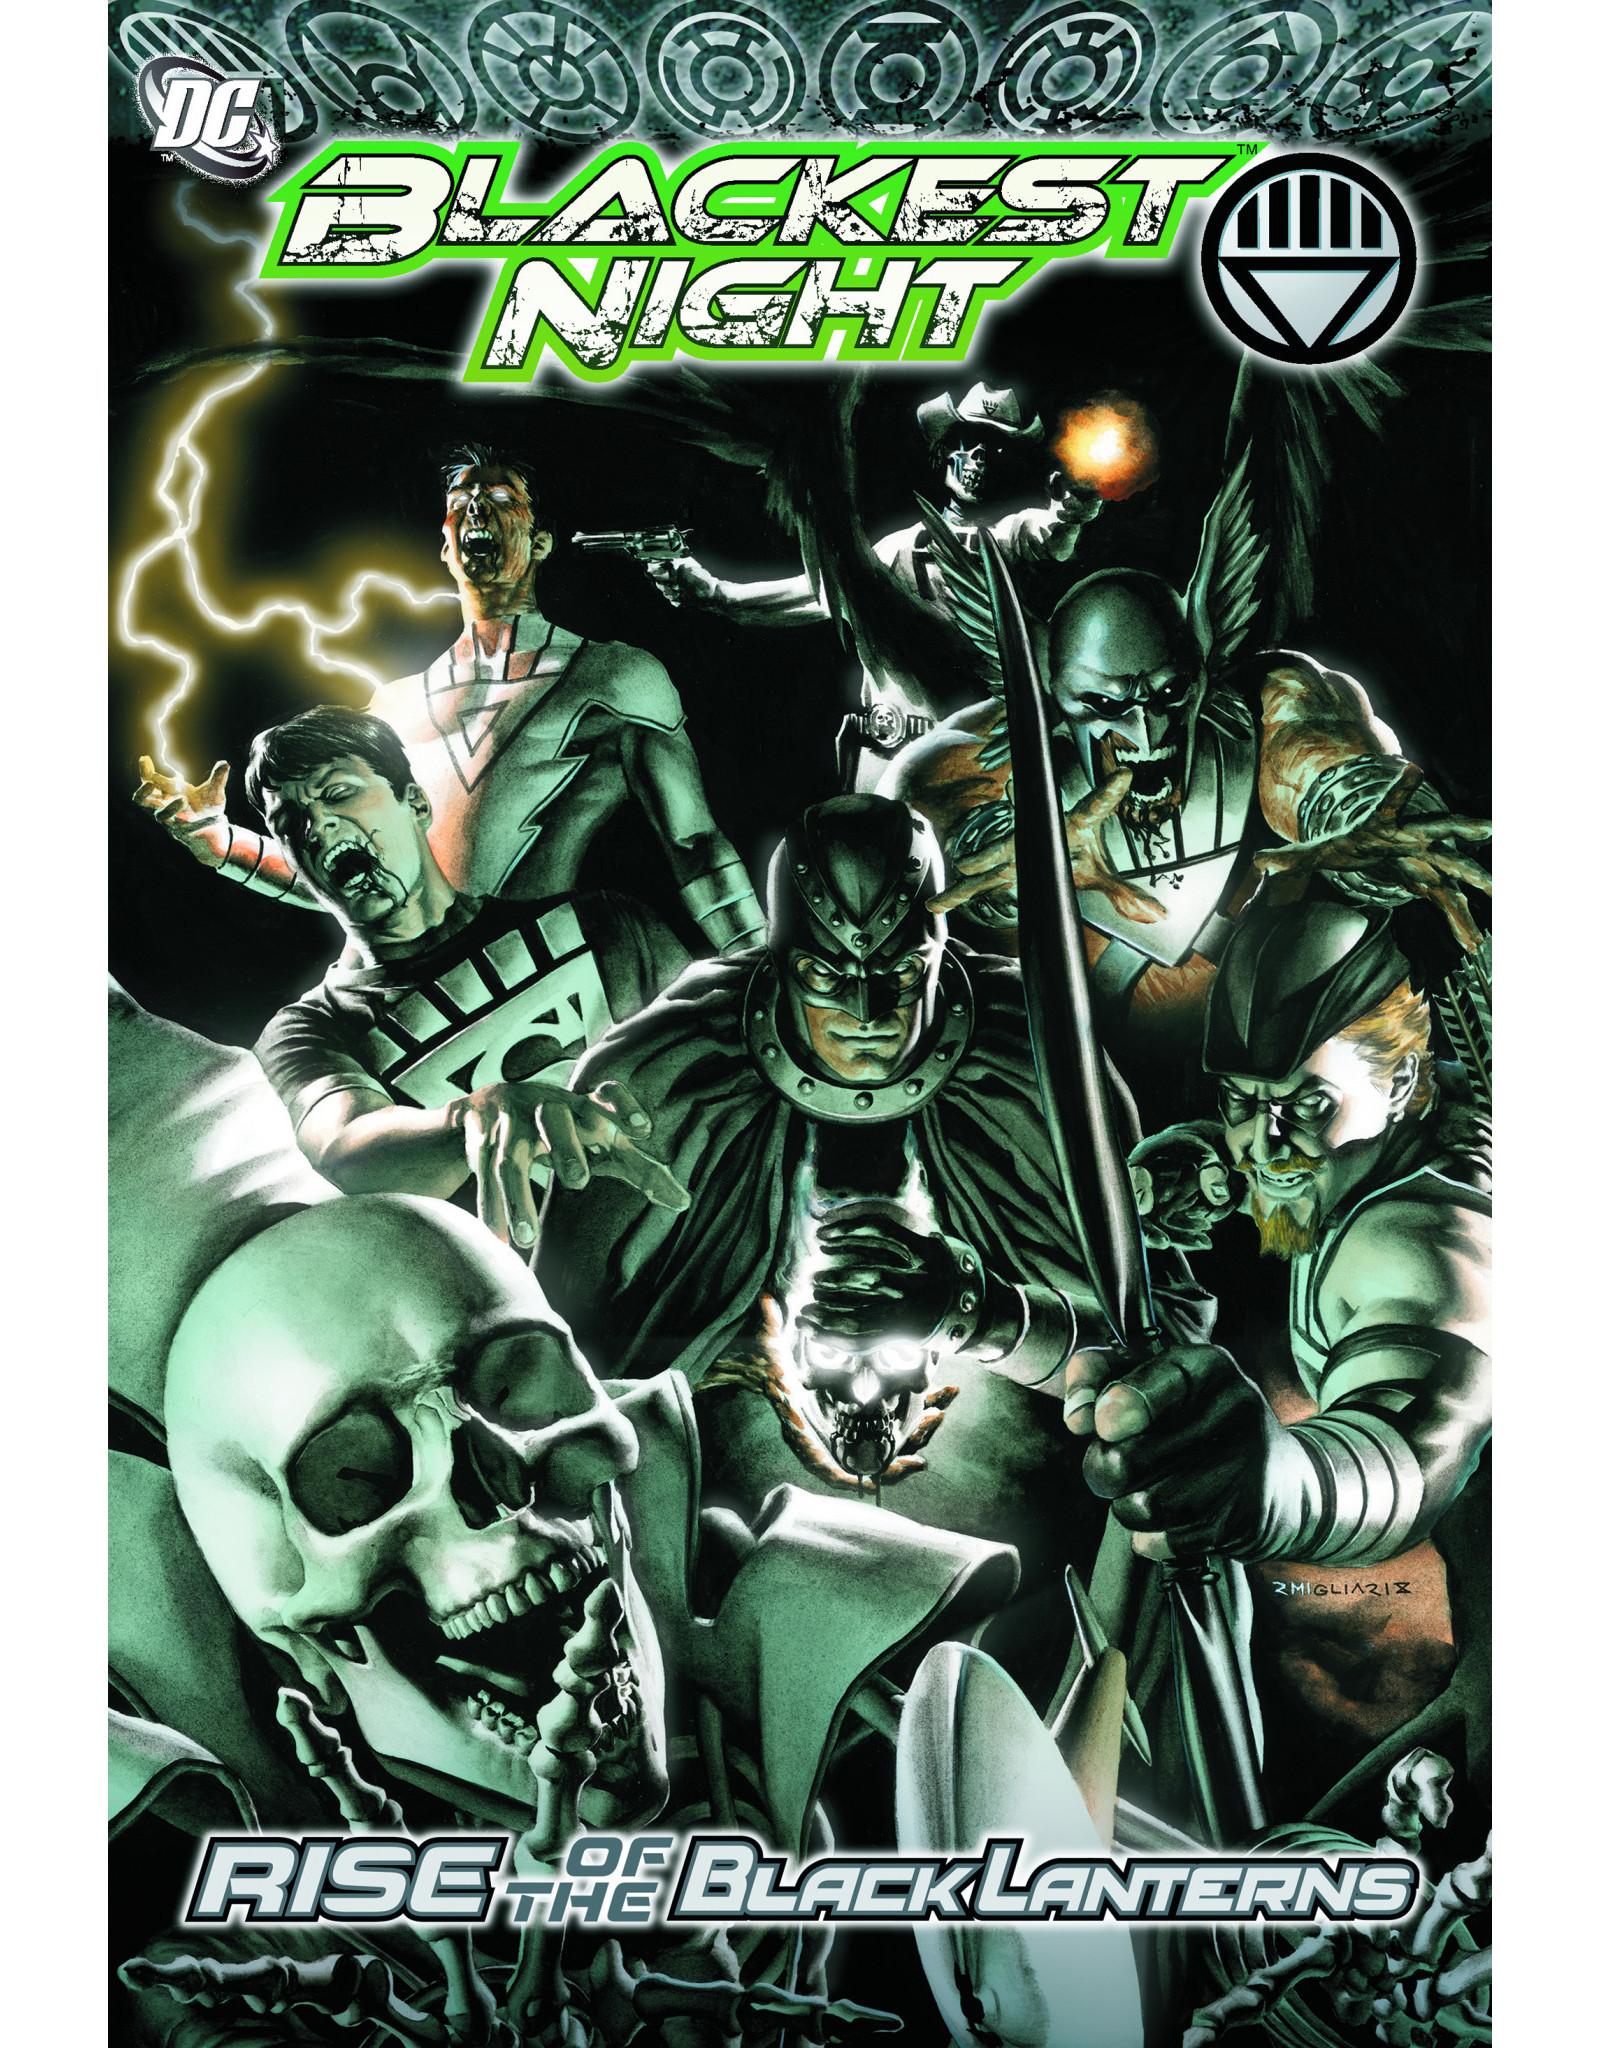 DC COMICS BLACKEST NIGHT RISE OF THE BLACK LANTERNS TP